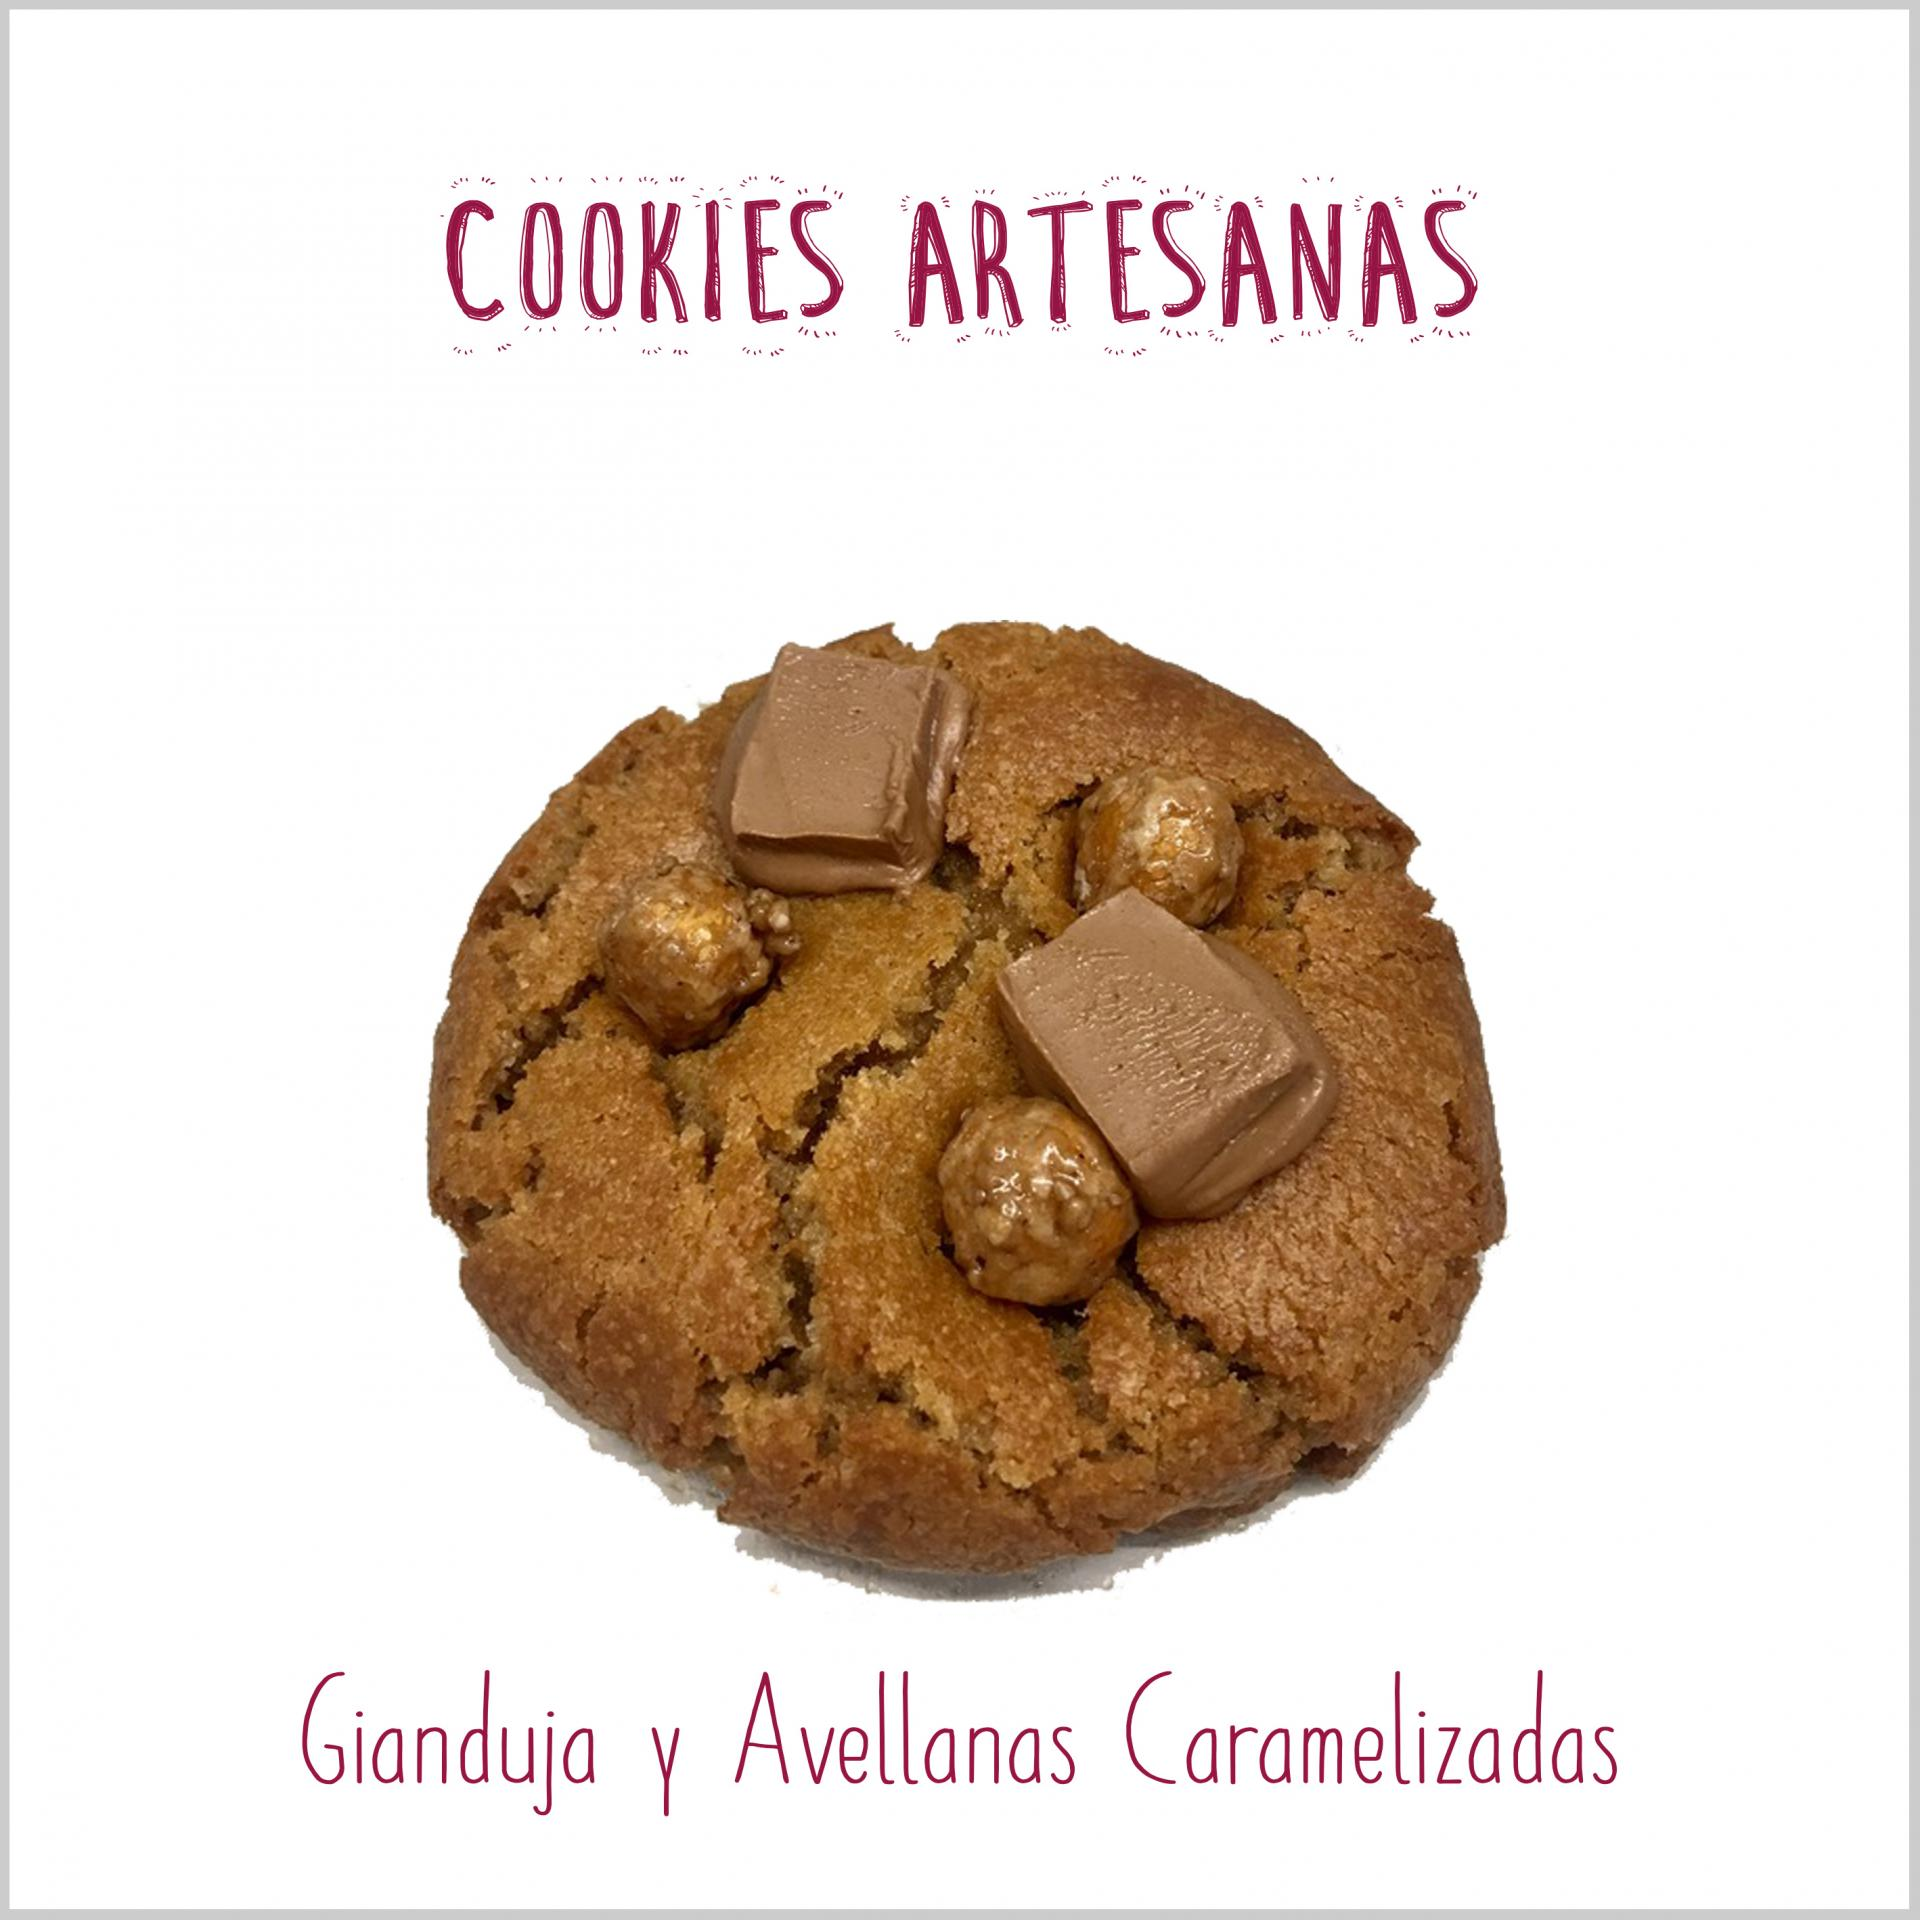 Gianduja y Avellanas Caramelizadas